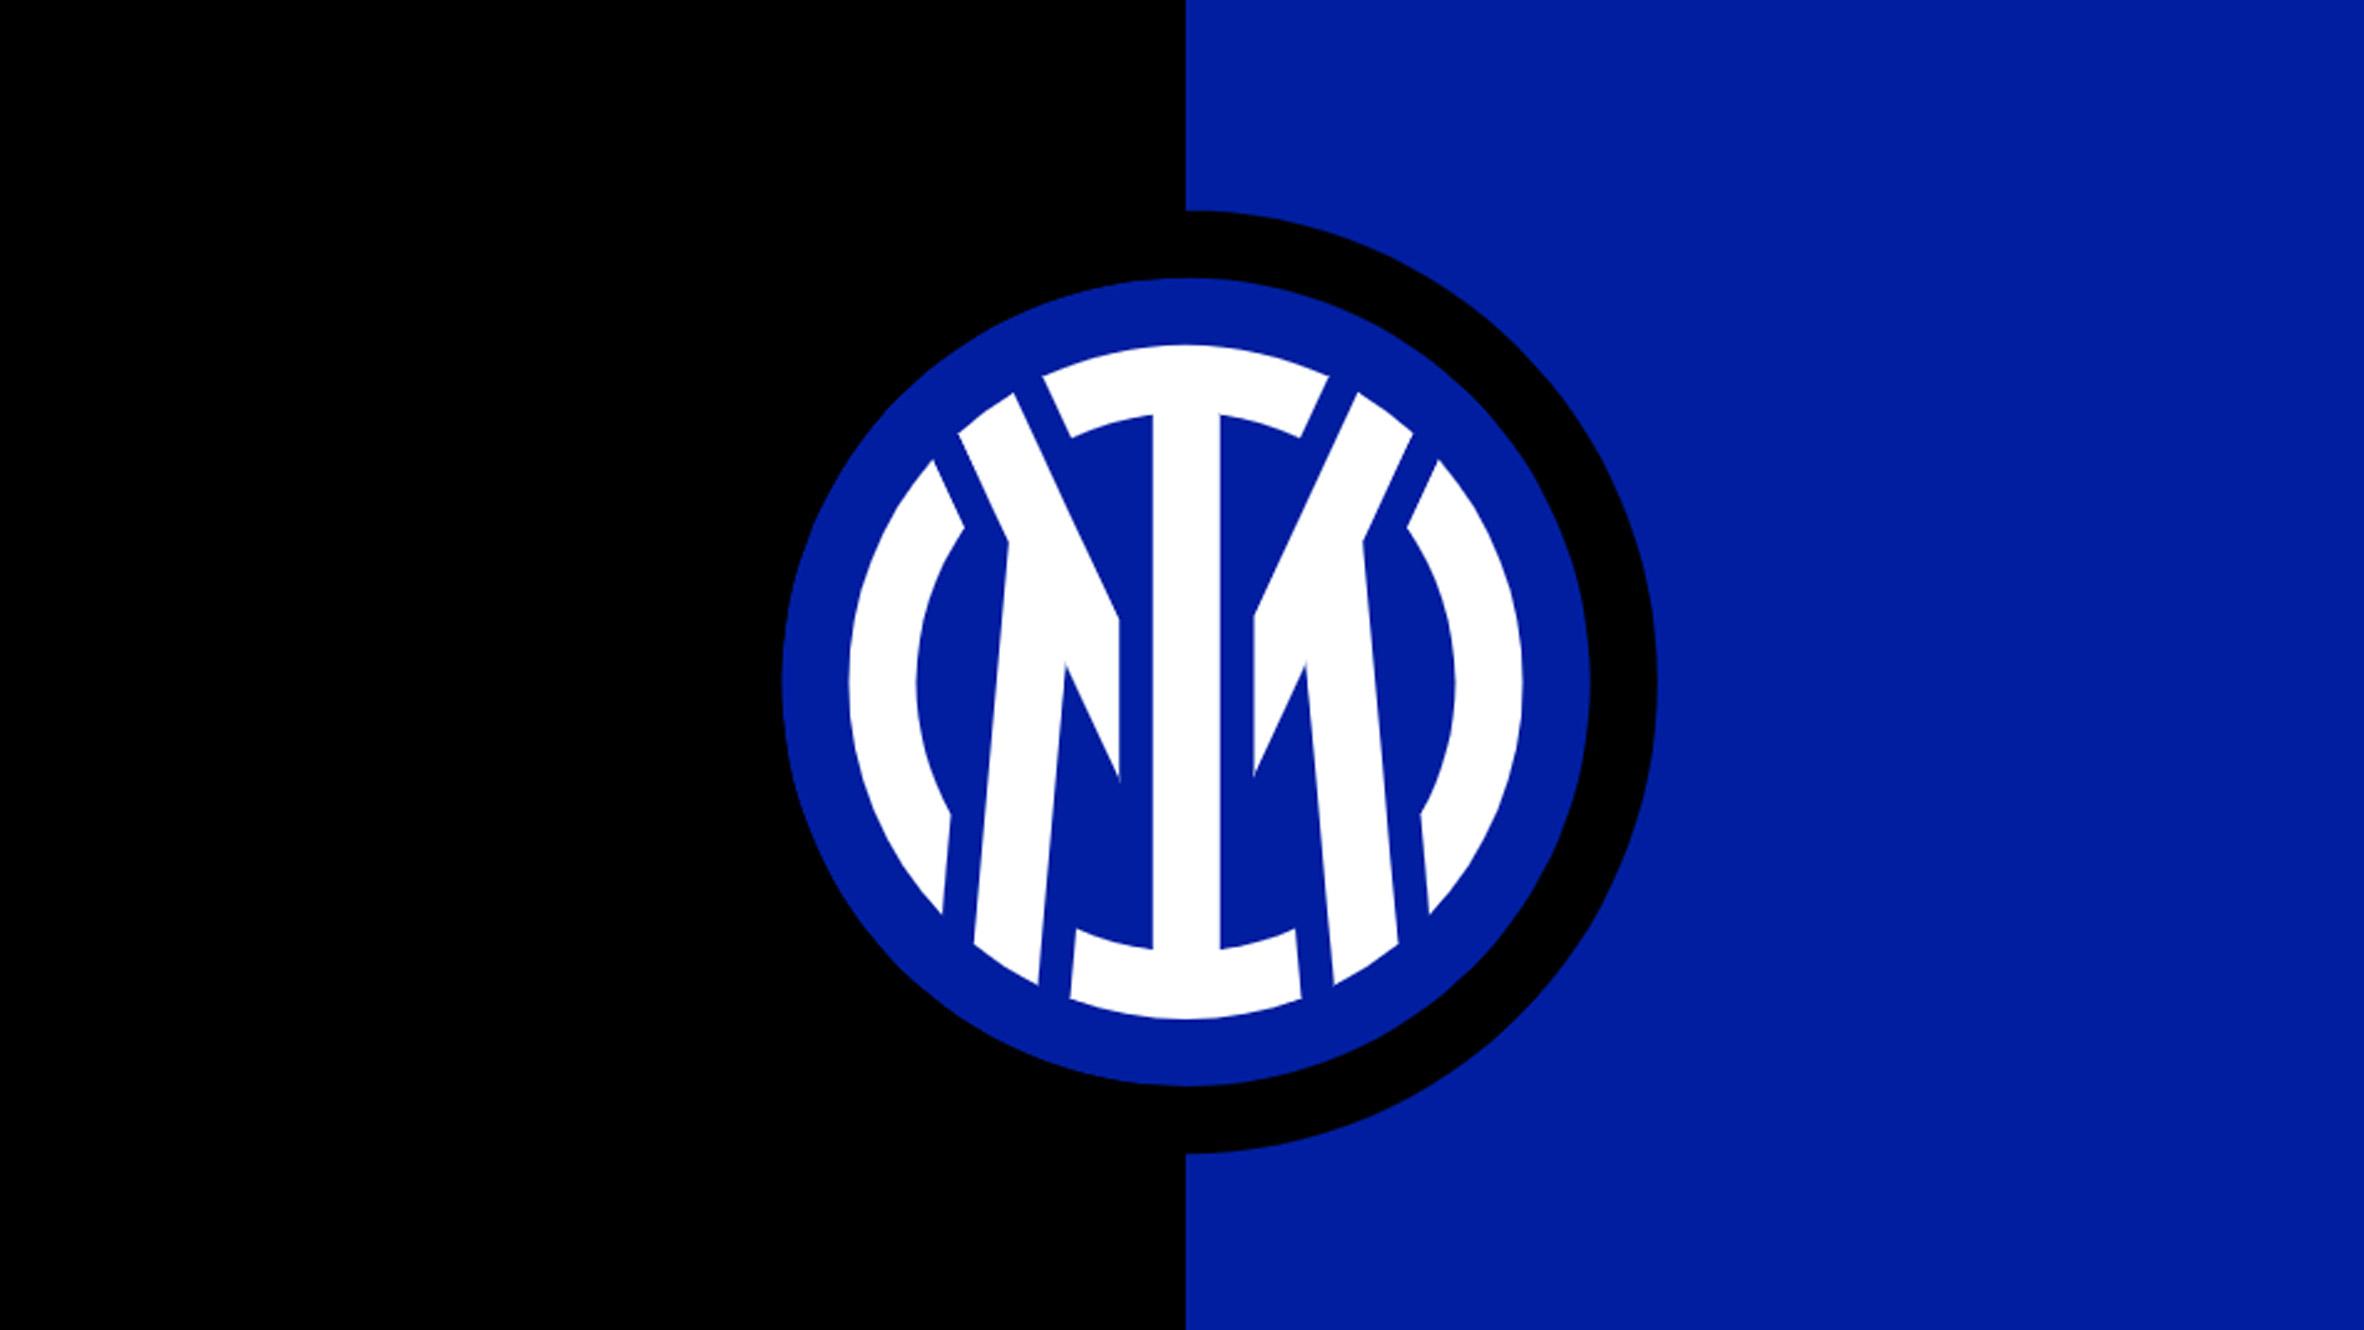 Inter Milan Football Club rebranding